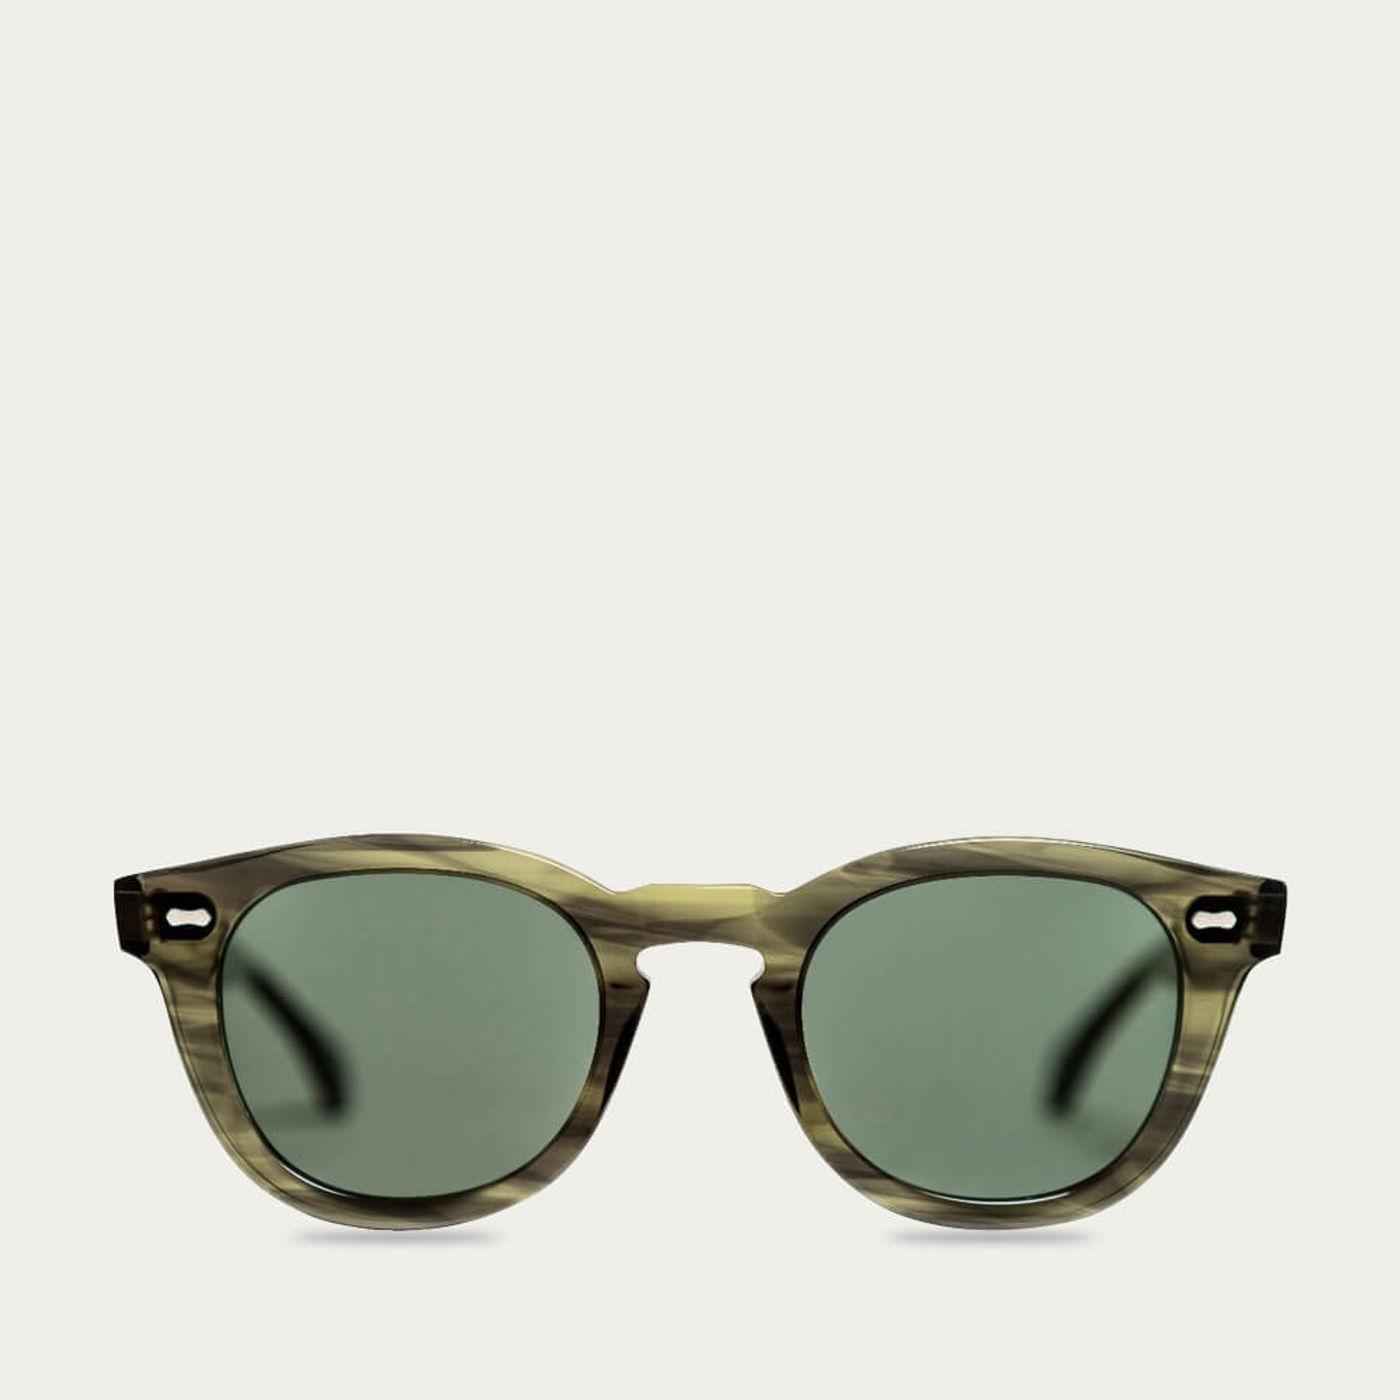 Eco Green /Bottle Green Donegal Sunglasses | Bombinate